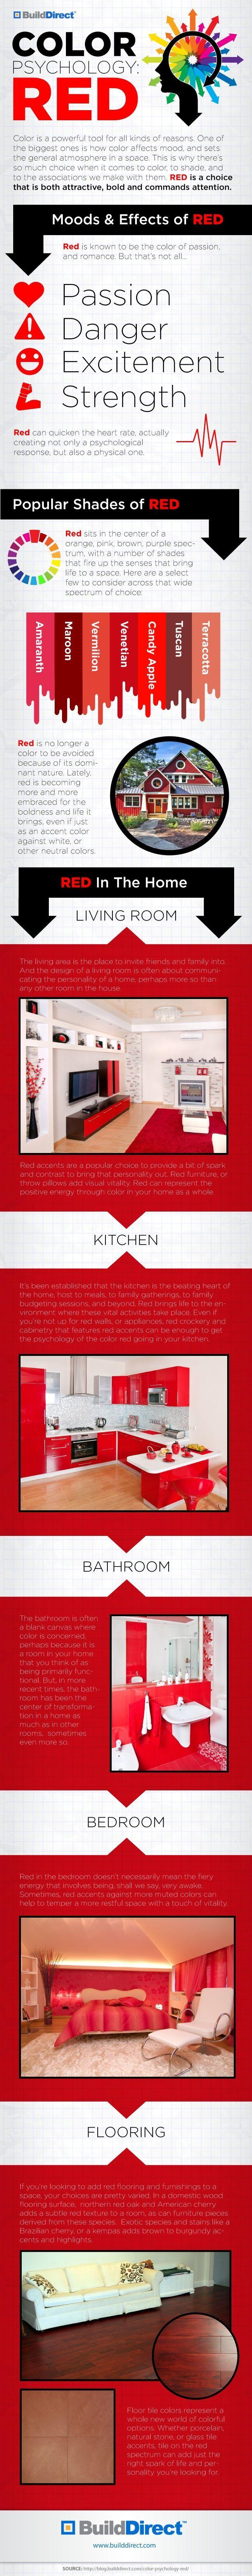 Emotional Interior Design Using Red Color psychology Colors